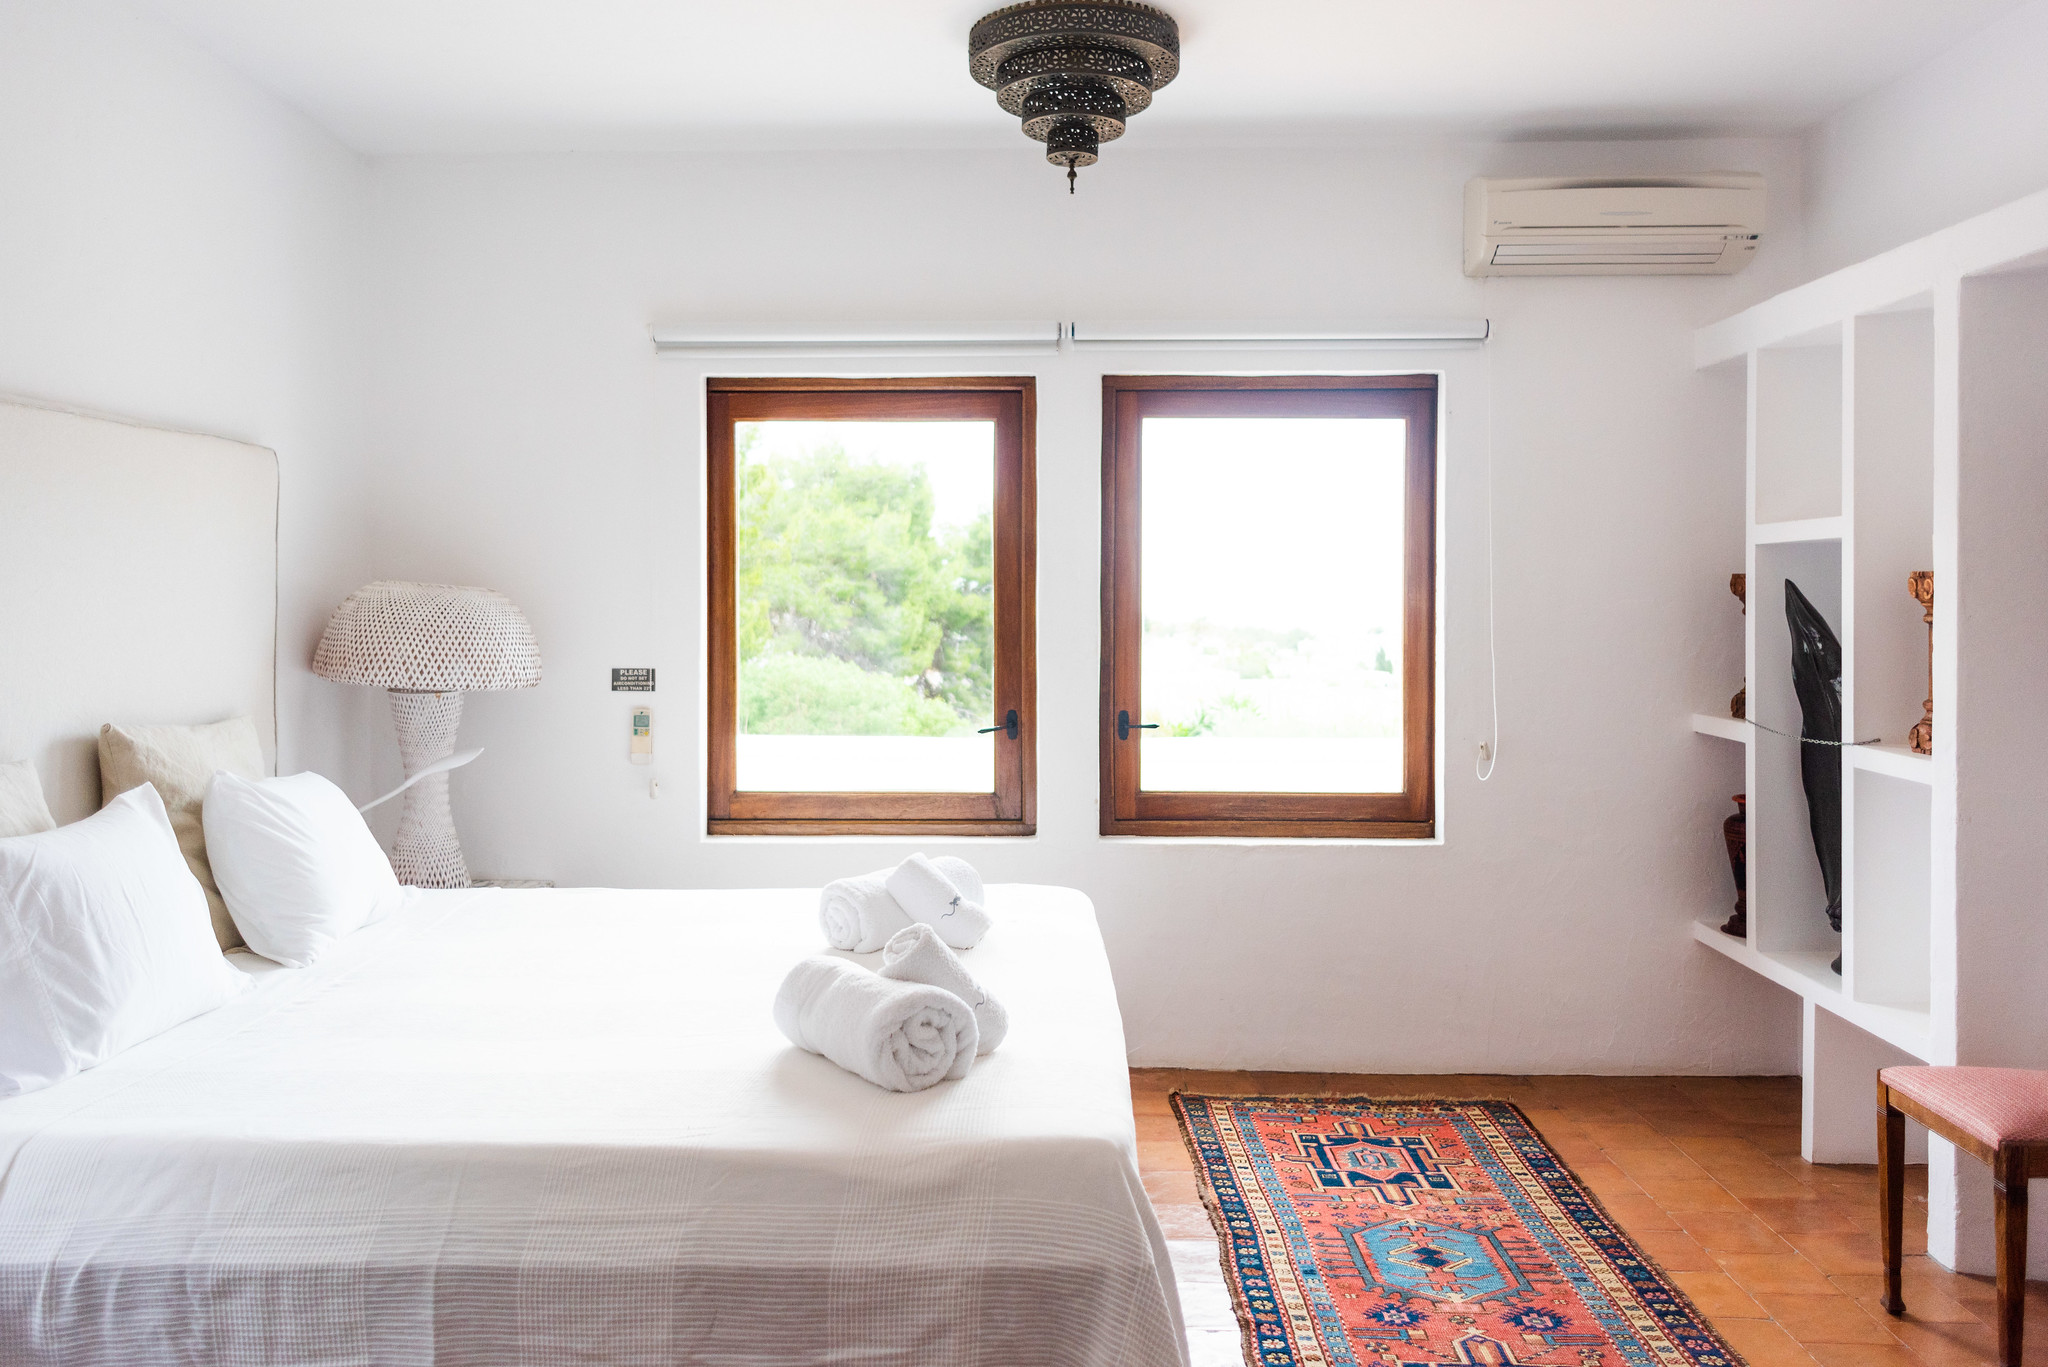 https://www.white-ibiza.com/wp-content/uploads/2020/05/white-ibiza-villas-can-lyra-double.jpg